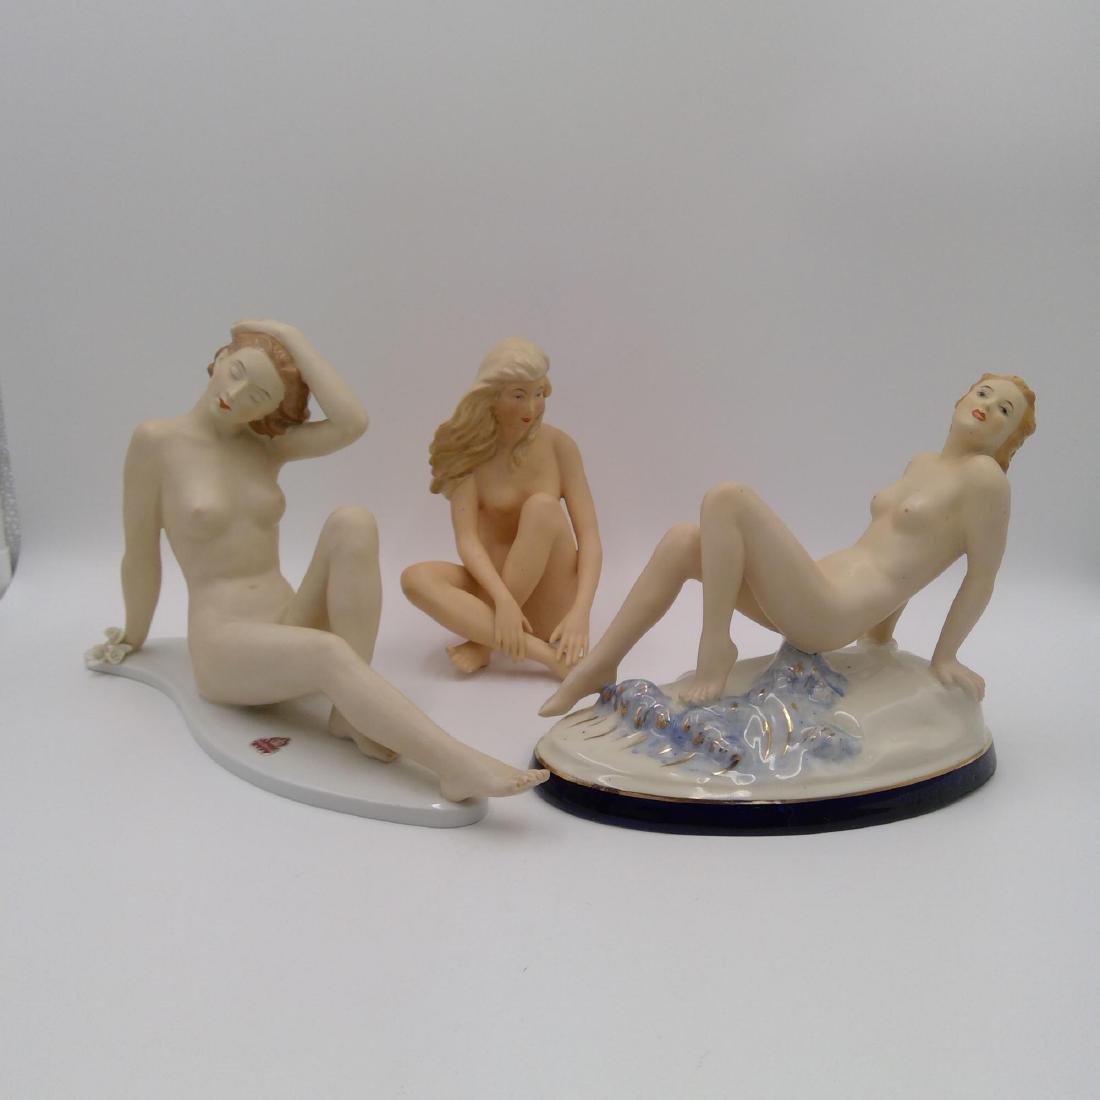 GROUP OF 3 NUDE ART DECO PORCELAIN FIGURINES